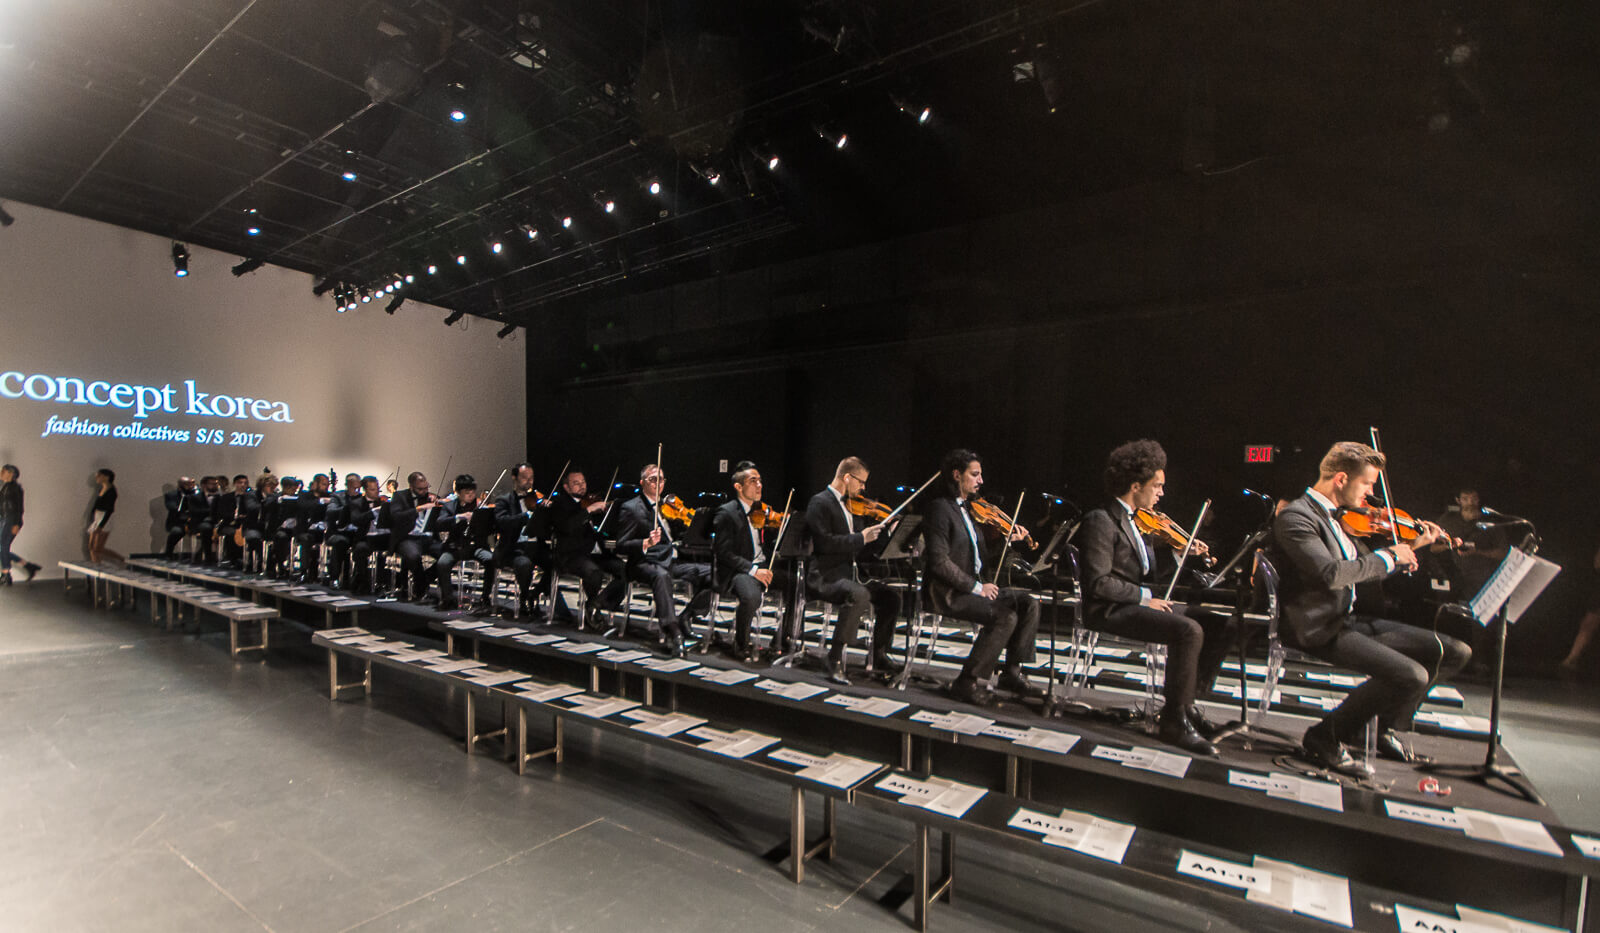 fashion orchestra